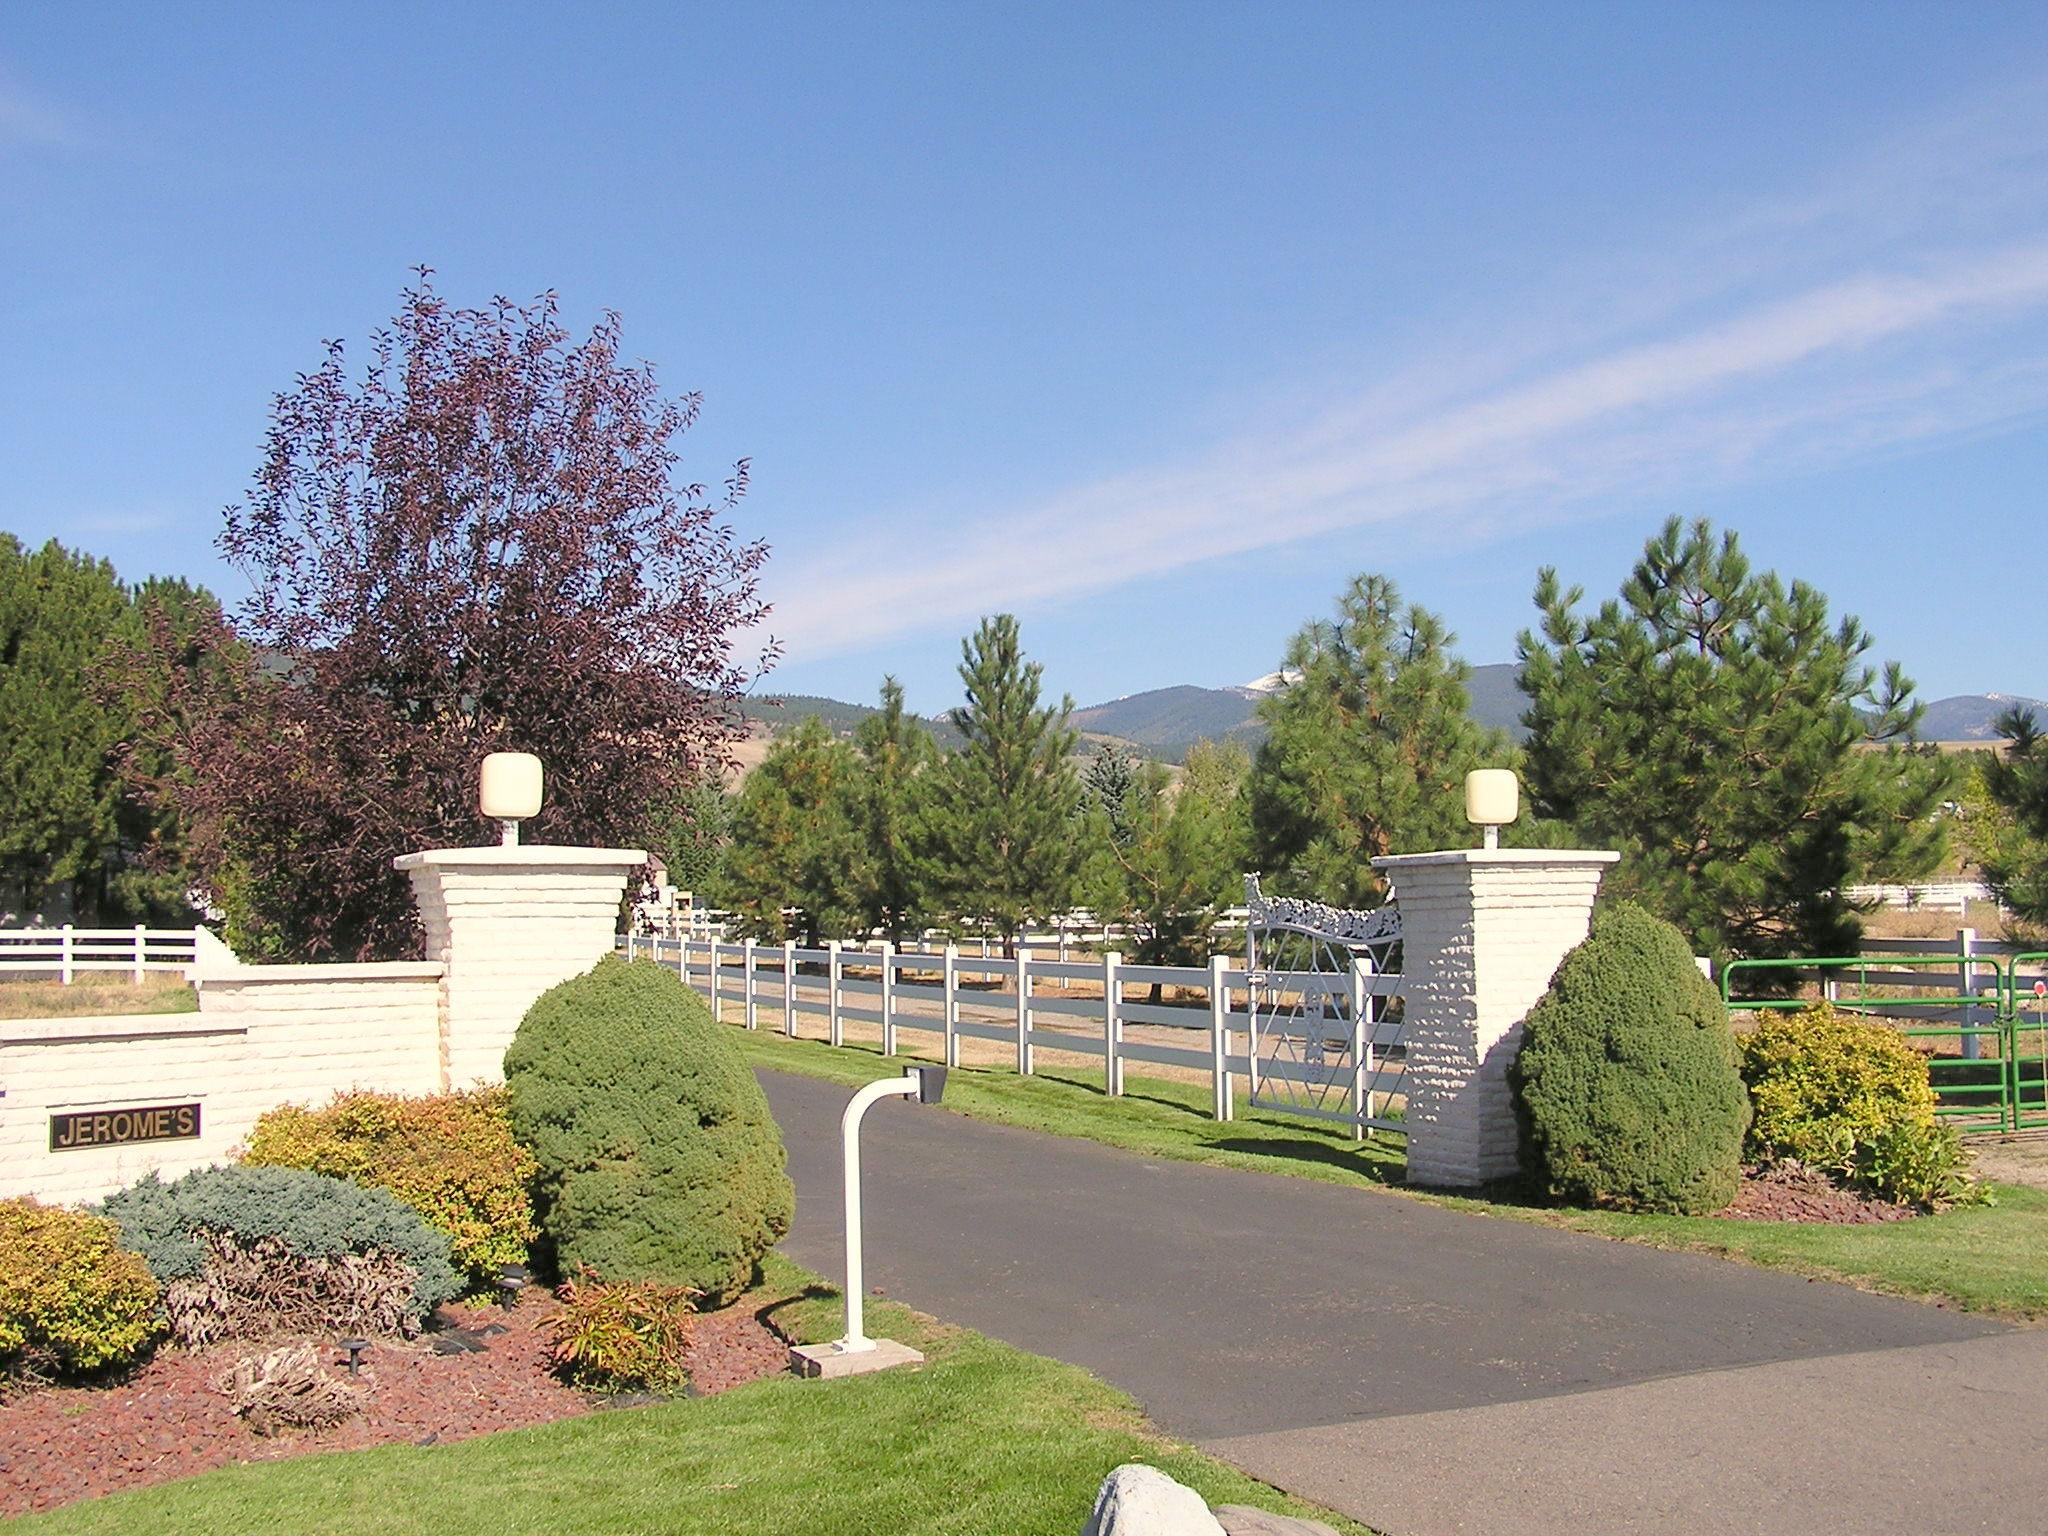 10705 George Cates Blvd, Missoula, Montana 59808